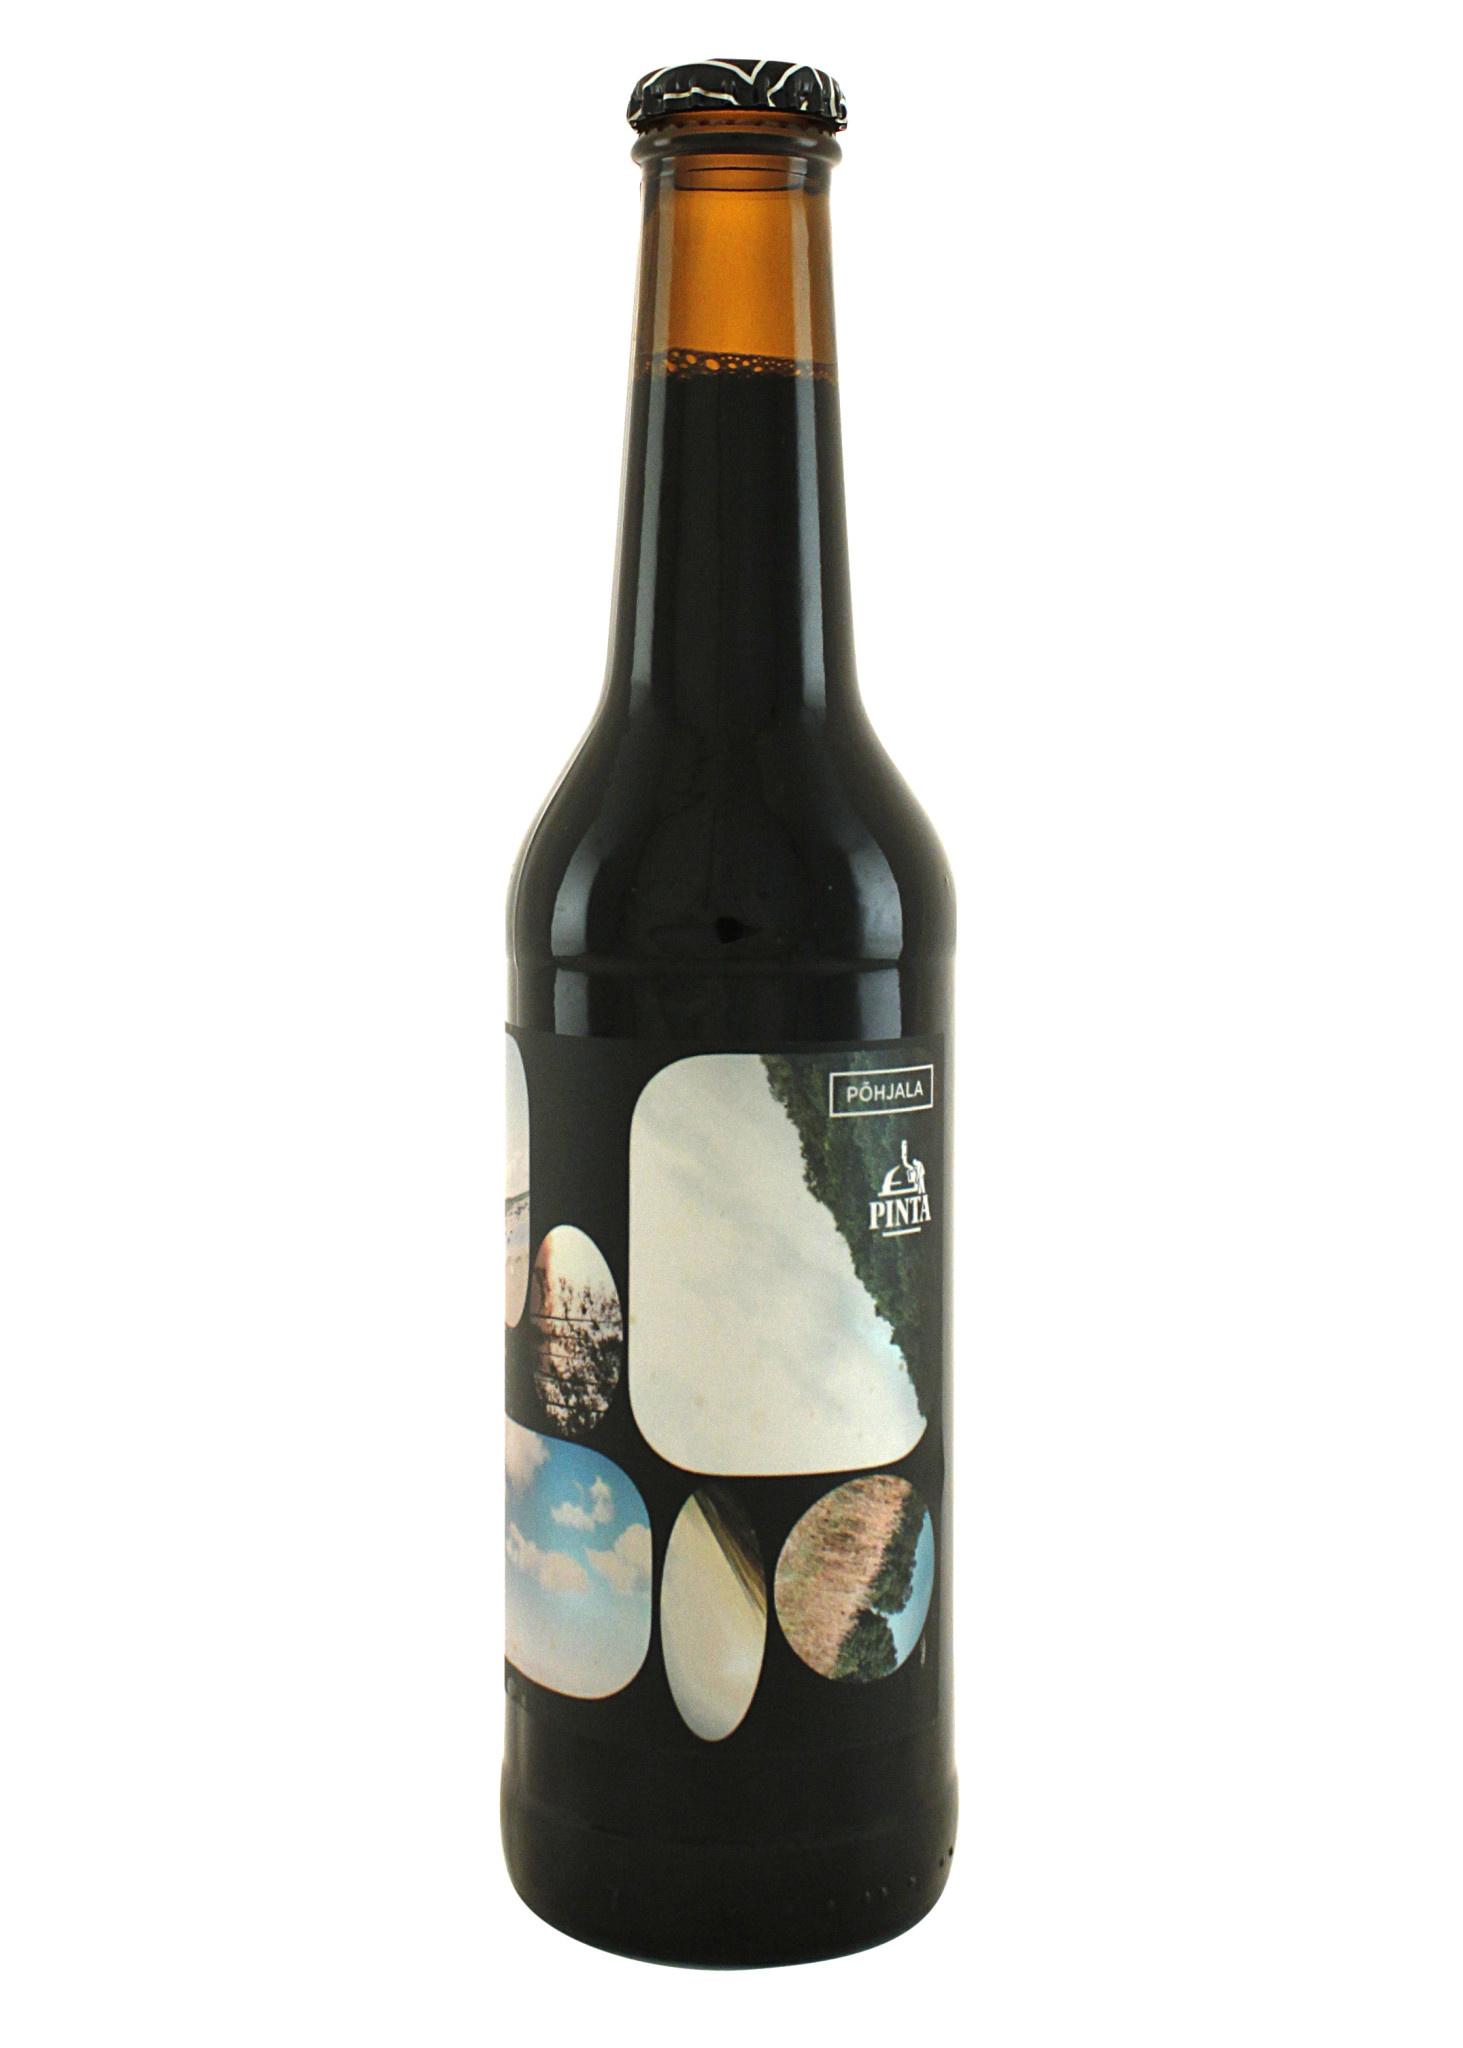 "Pohjala/Pinta ""Baltic Pride"" Baltic Porter 330ml. Bottle - Estonia"